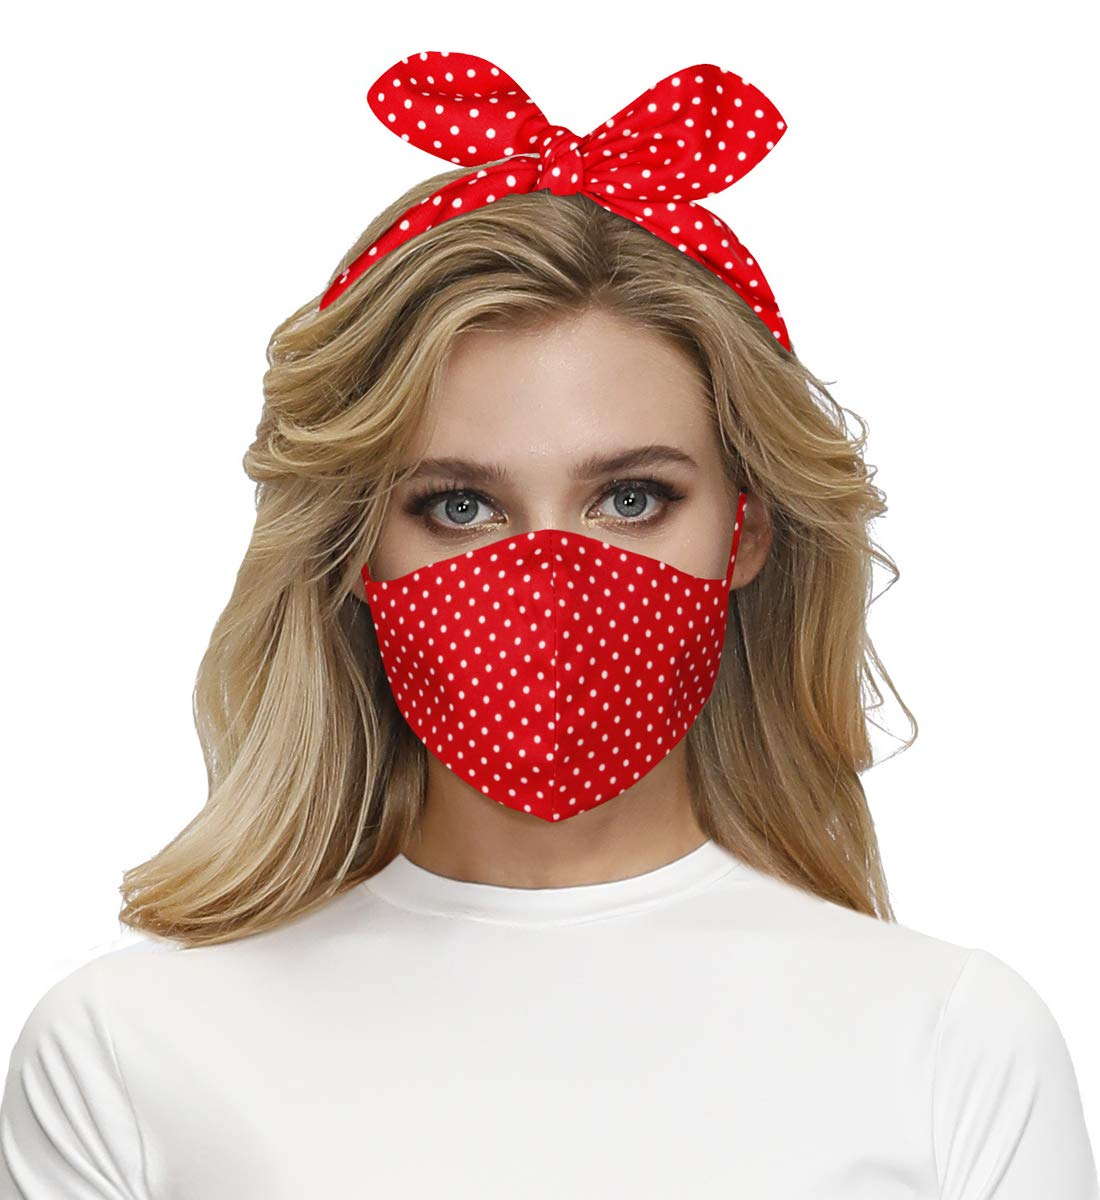 Christmas Face Mask Headband Bandana for Women Decorative Neck Gaiter Breathable Reusable Cloth Mask Washable Face Cover Red Polka Dot